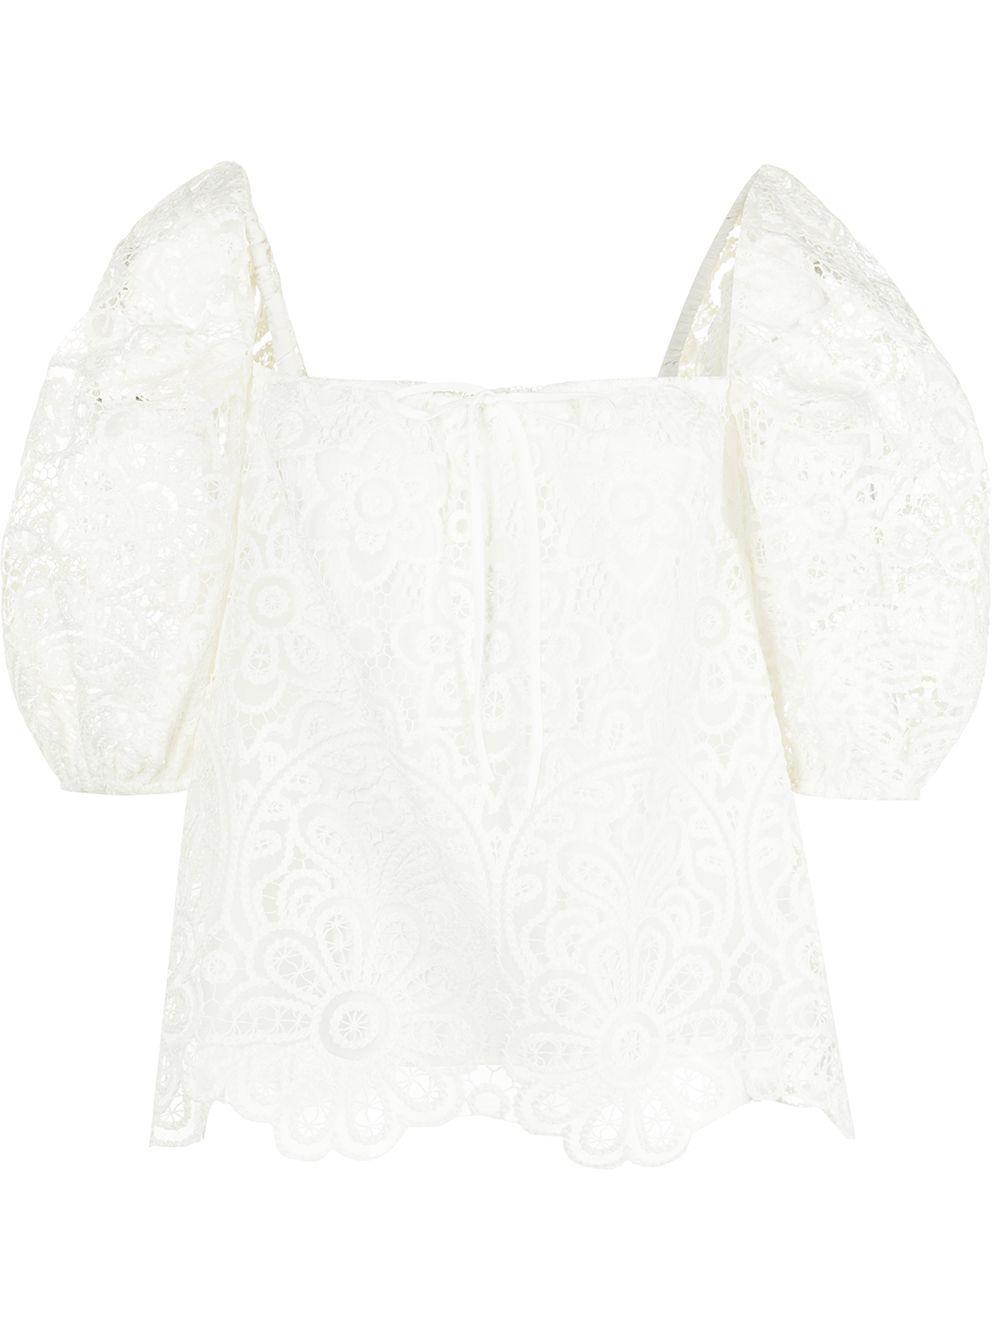 Ruby Crochet Top Item # 221-2118-G